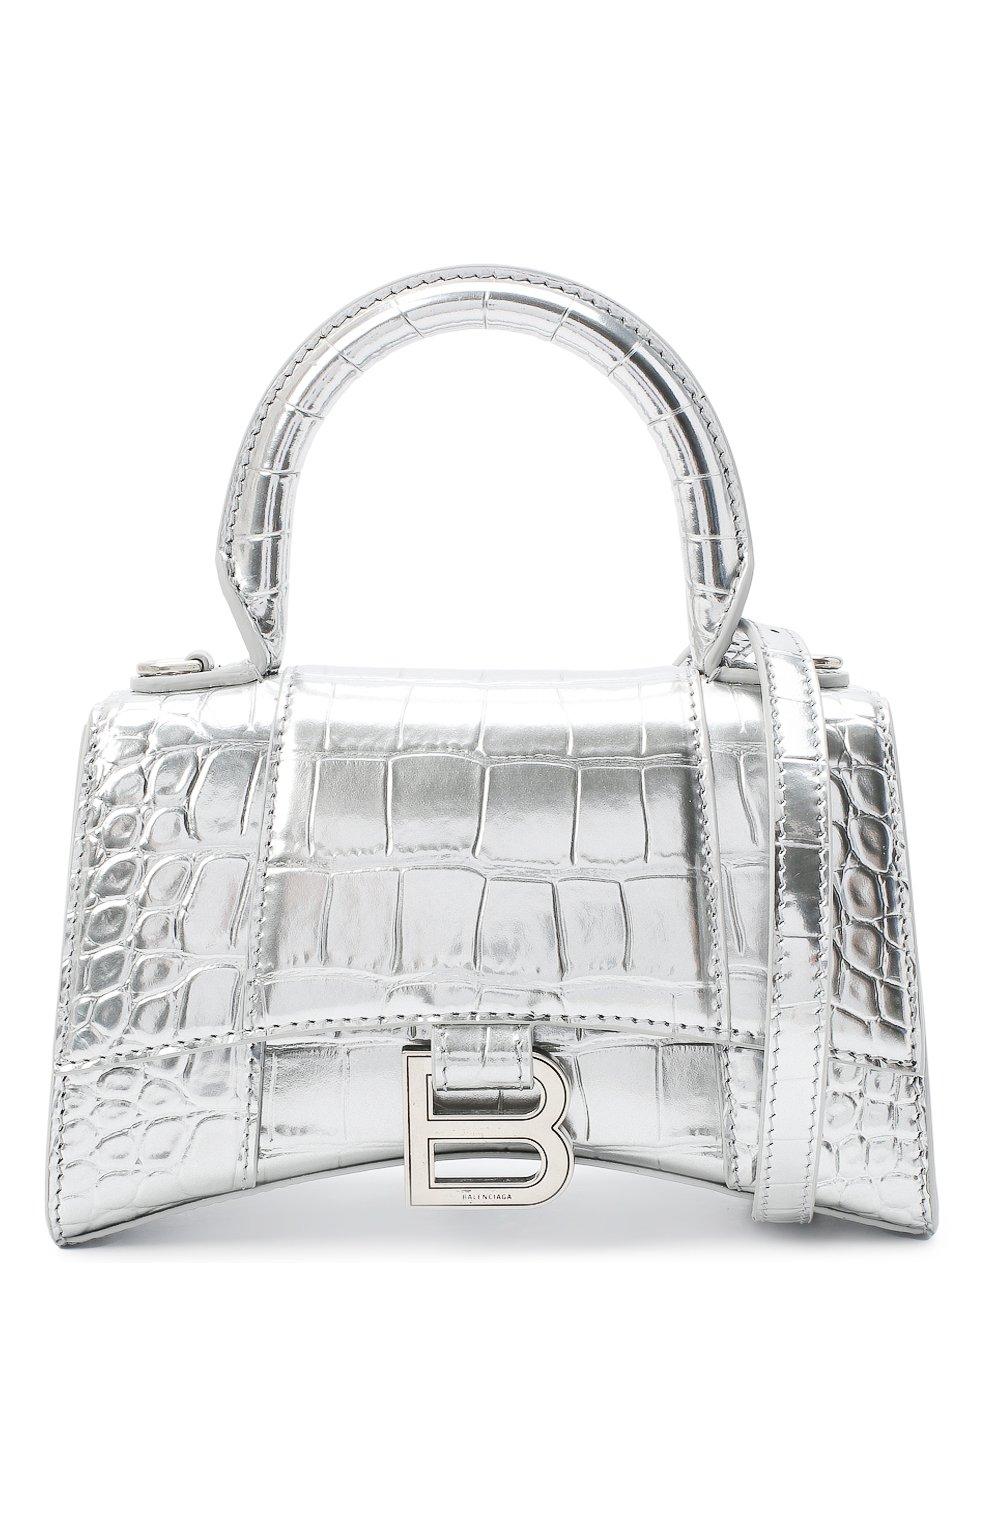 Женская сумка hourglass xs BALENCIAGA серебряного цвета, арт. 592833/1S49Y | Фото 6